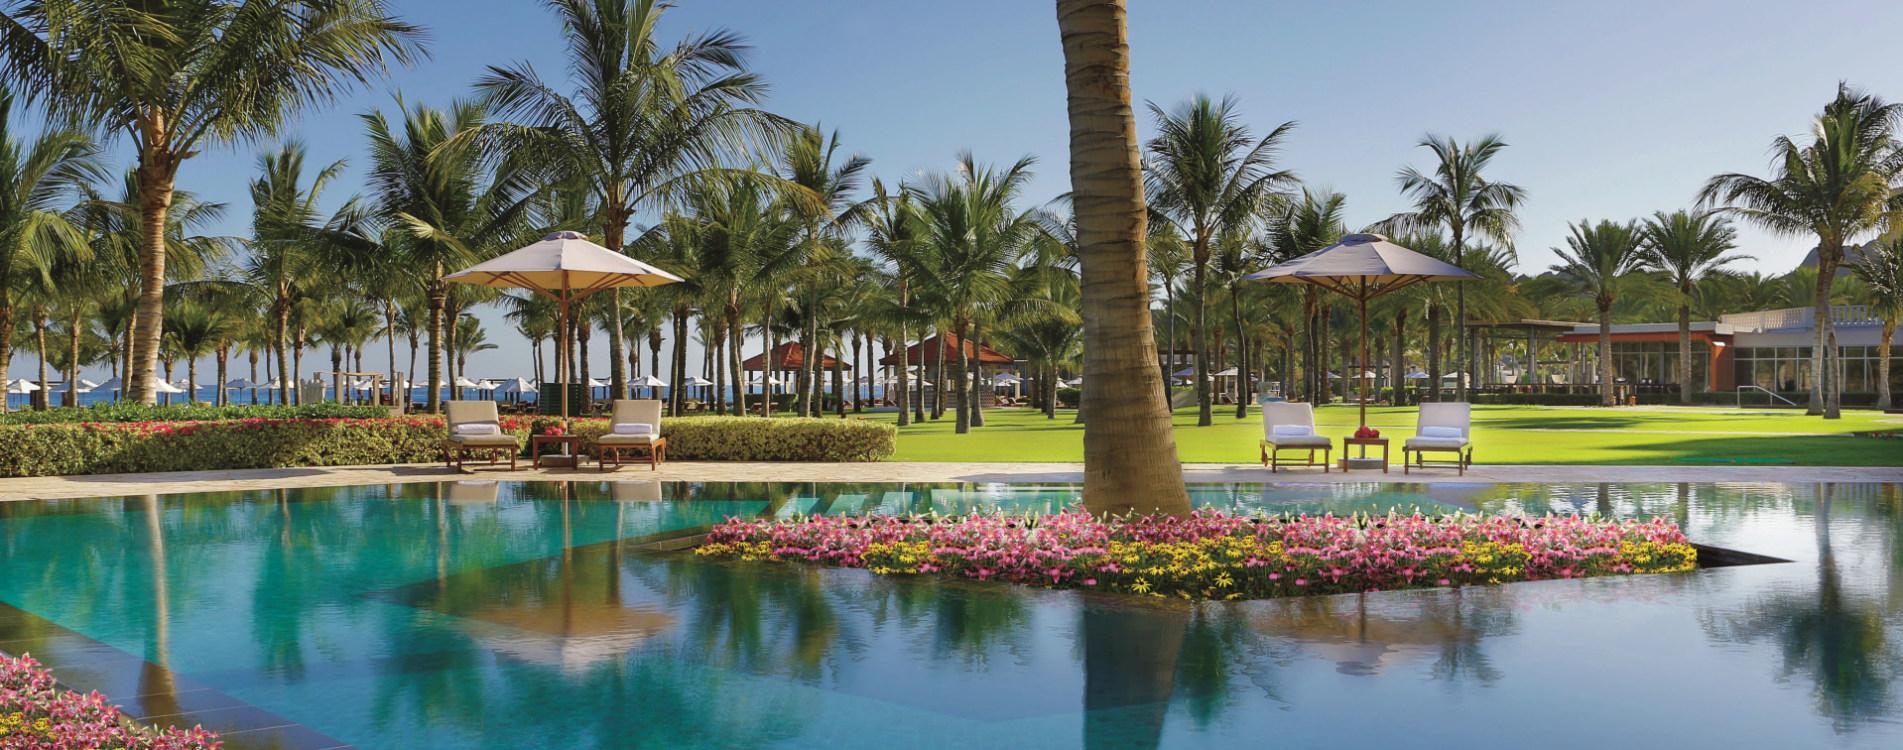 Al-Bustan-Palace-Muskat-Deluxe-Lagoon-Access -Pool-Oman.jpg